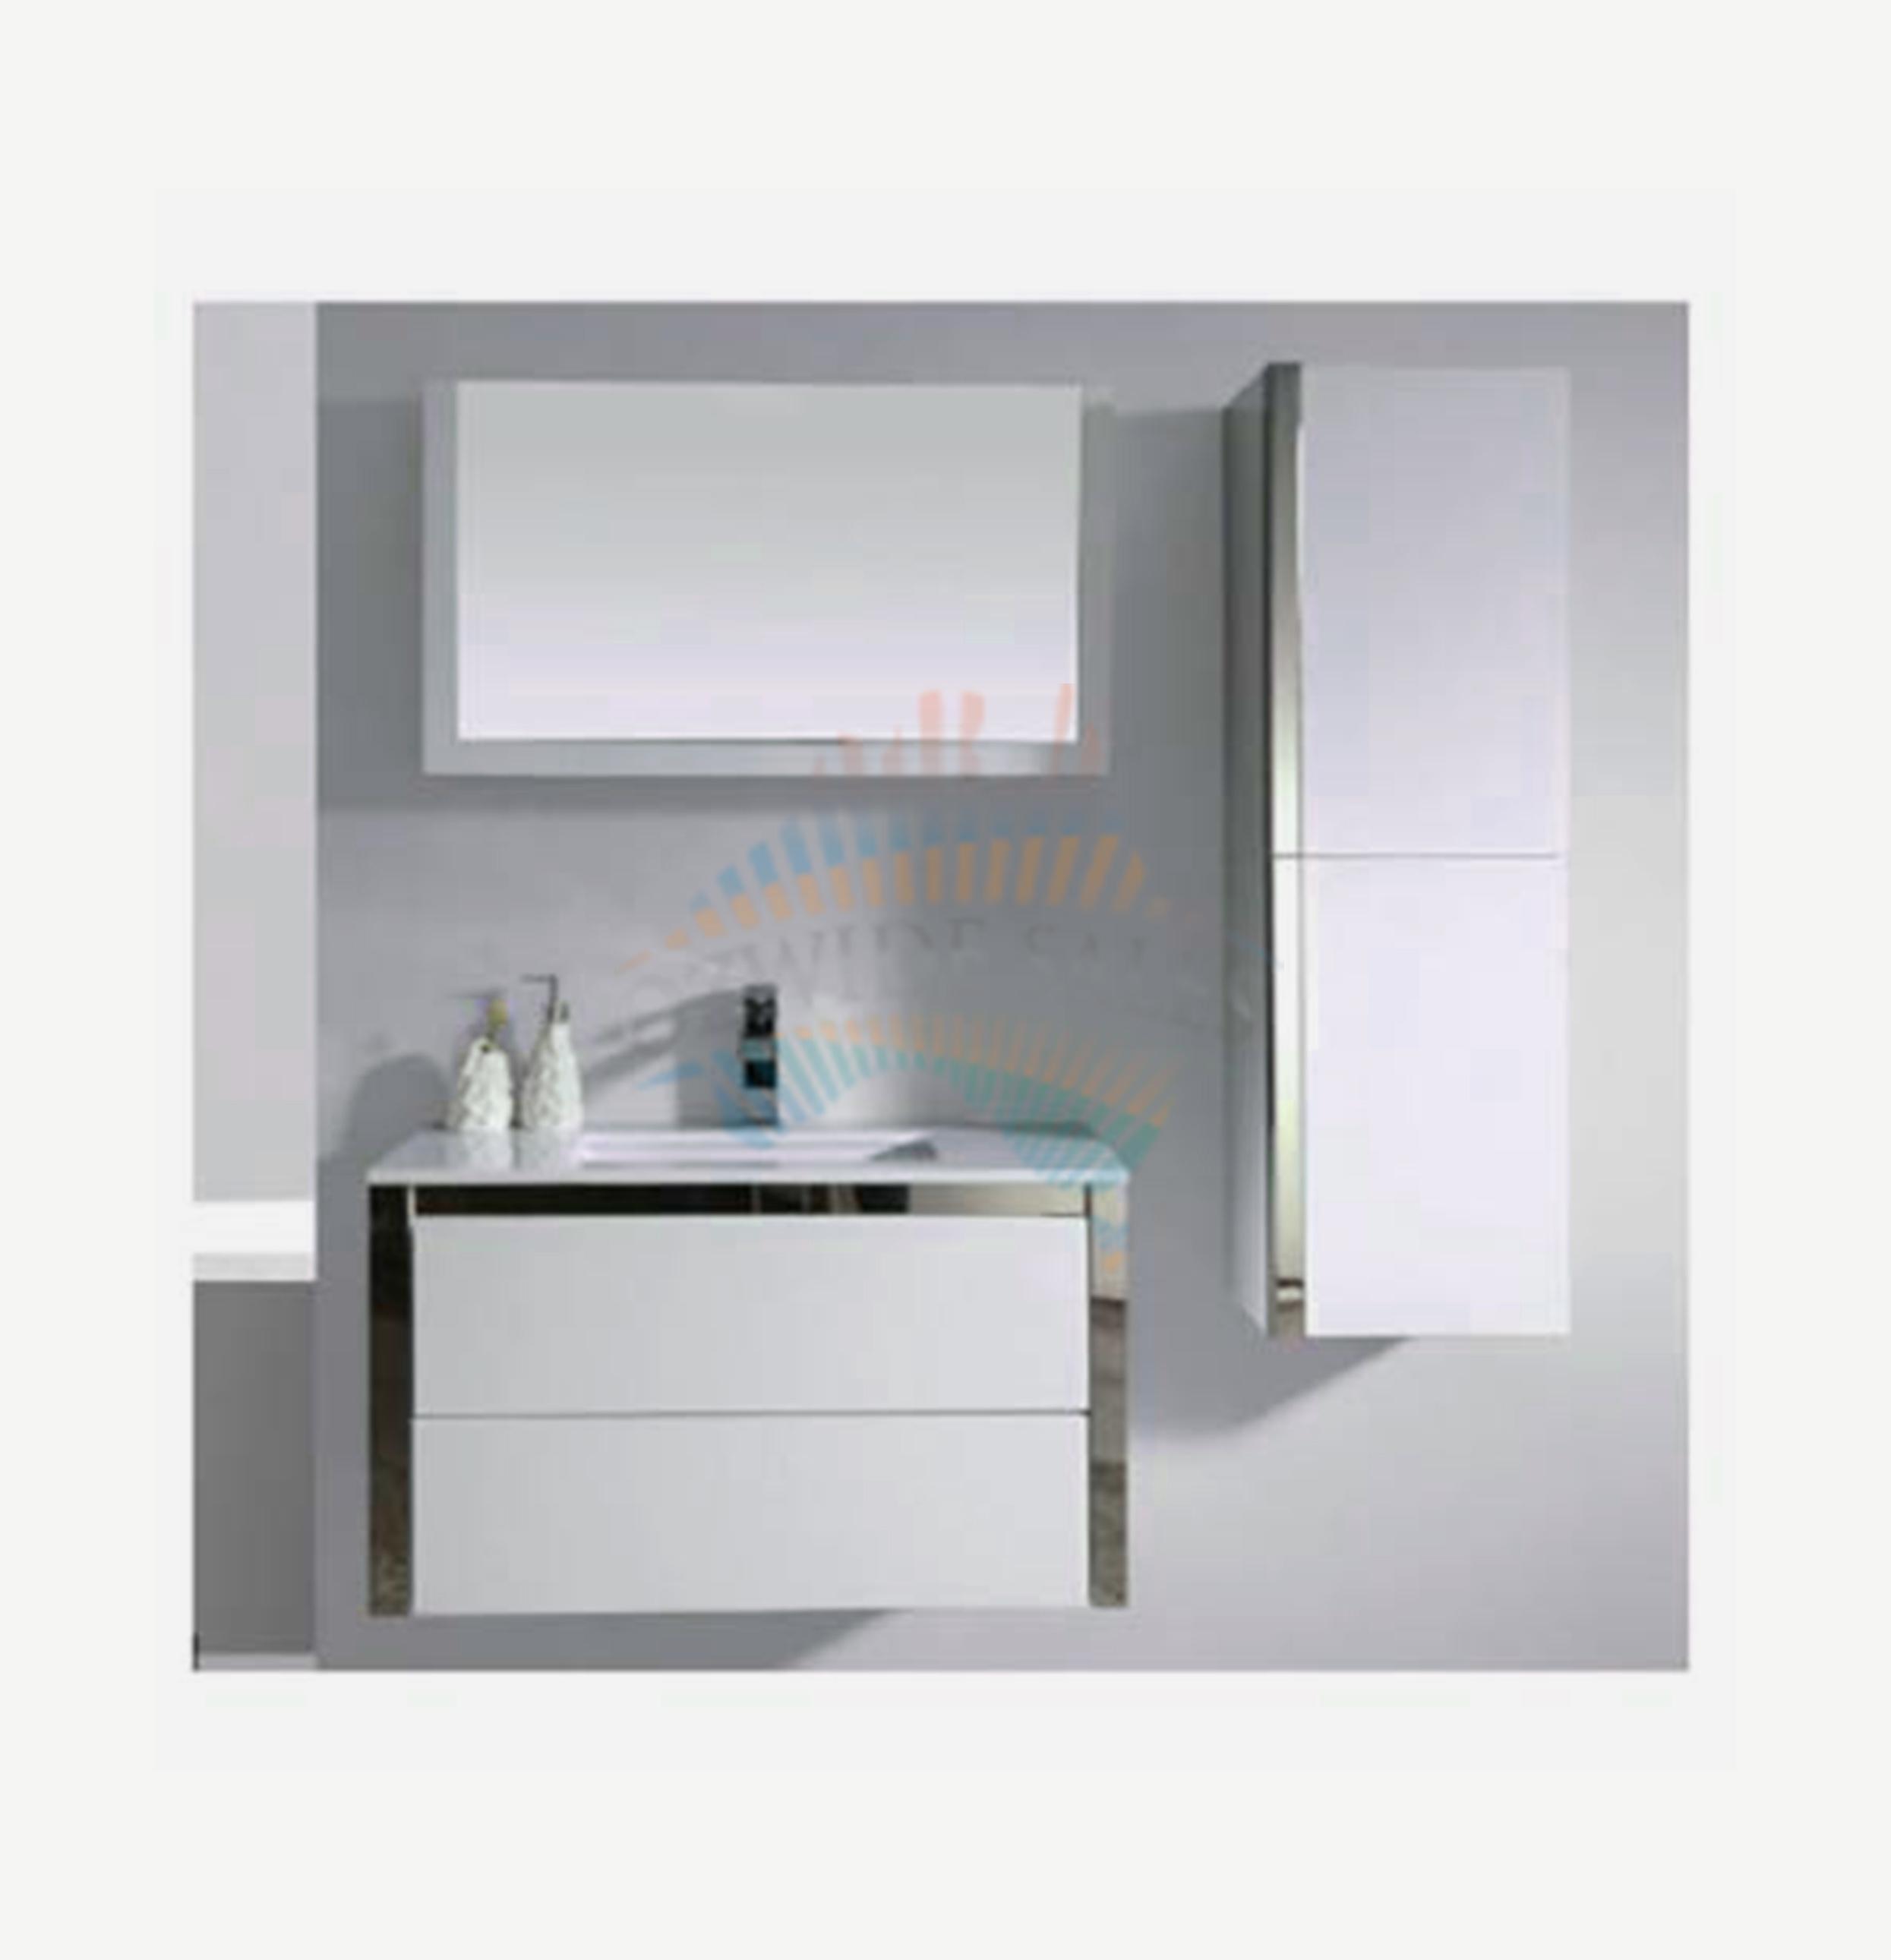 Famous Plan Your Bathroom Design Big Images For Small Bathroom Designs Round Bathtub 60 X 32 X 21 Small Bathroom Ideas With Shower And Tub Old Bathroom Mirror Circle GreenApartment Bathroom Renovation Wall Hung Bathroom Vanity NEW 900 Mm White Gloss \u0026amp; Chorme Edge ..